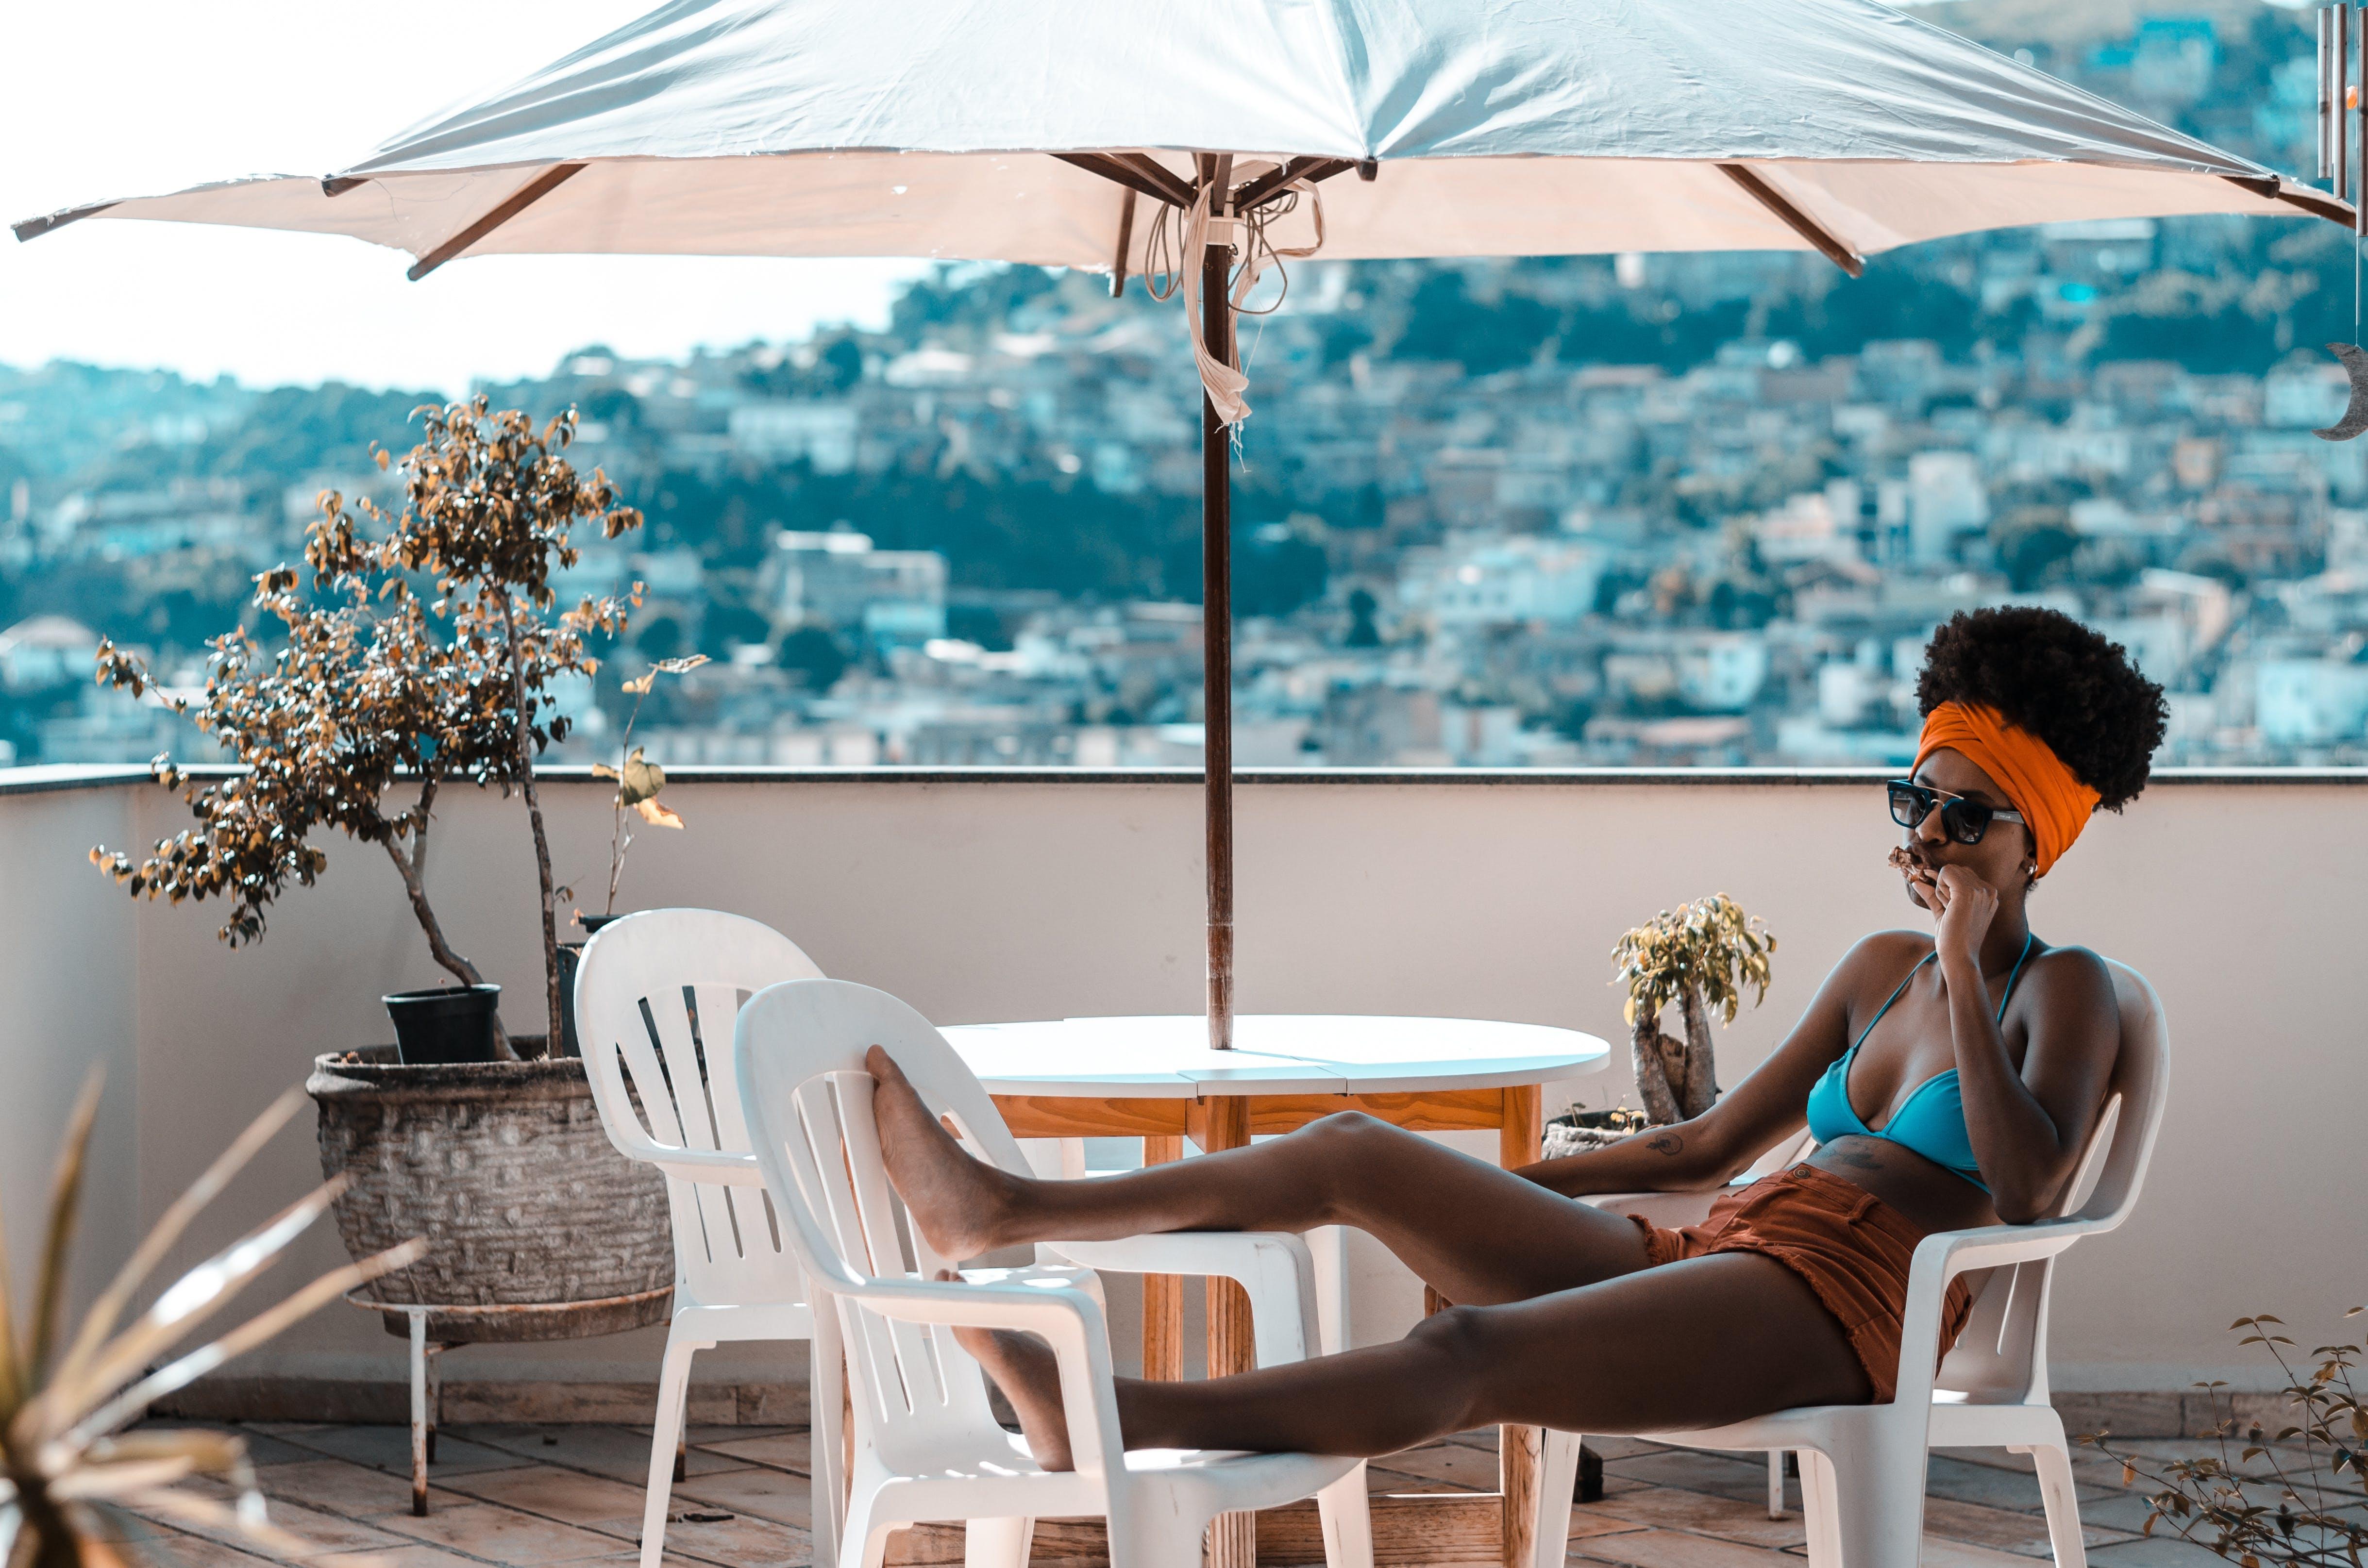 black woman, female, leisure